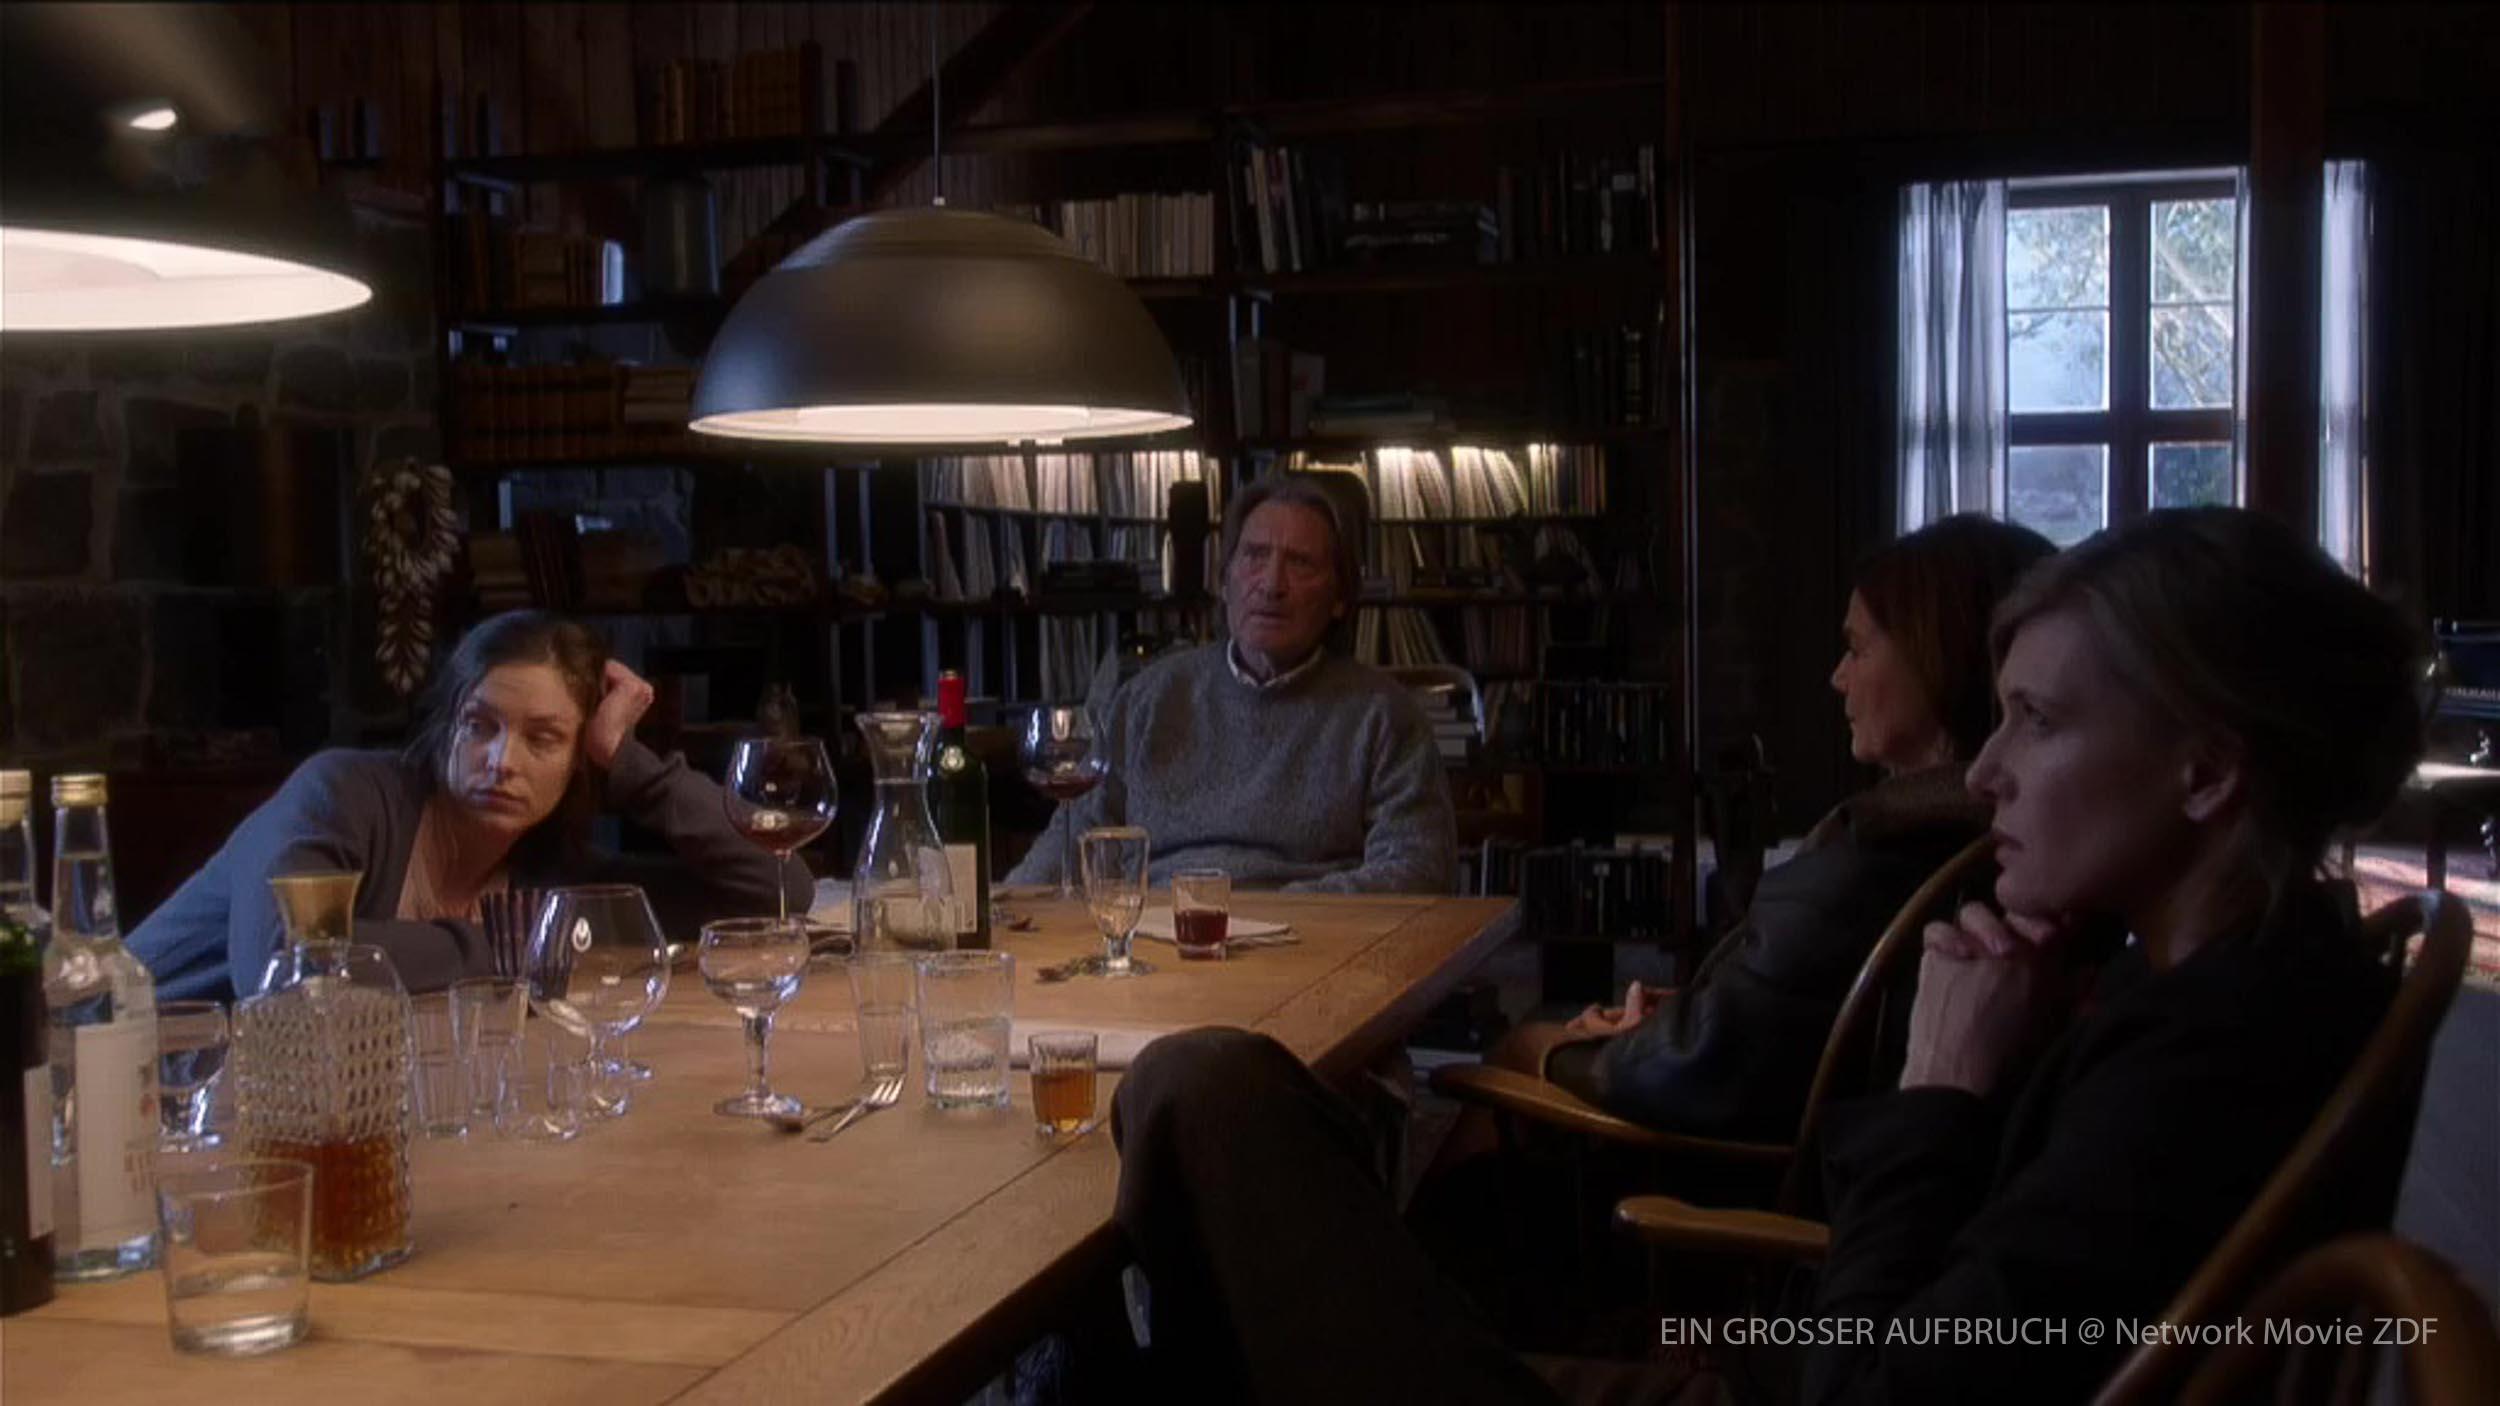 EIN GROSSER AUFBRUCH Regie Matti Geschonneck Szenenbild Thomas Freudenthal-27.jpg